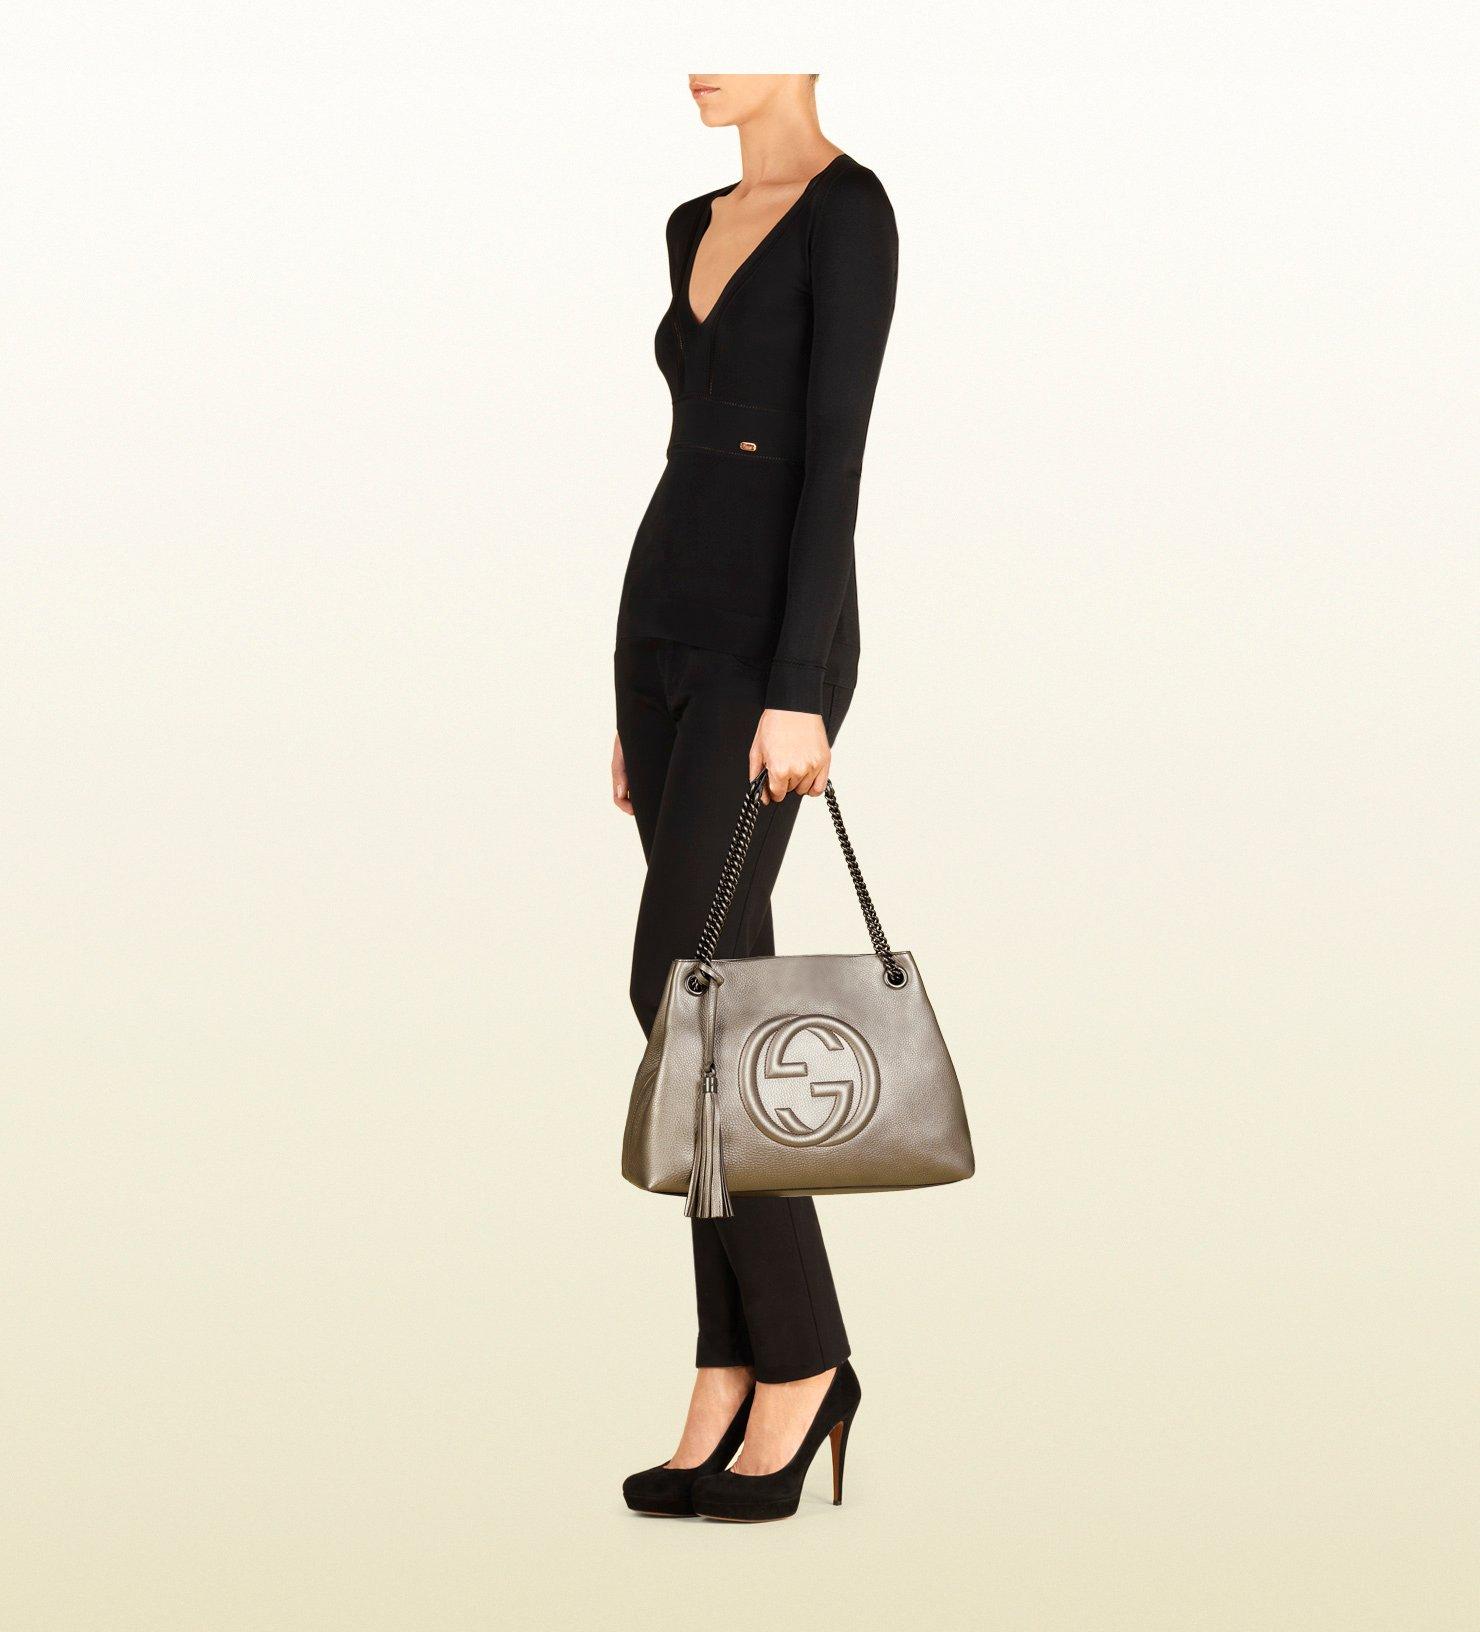 1632b0983 Gucci Soho Metallic Leather Shoulder Bag in Gray - Lyst